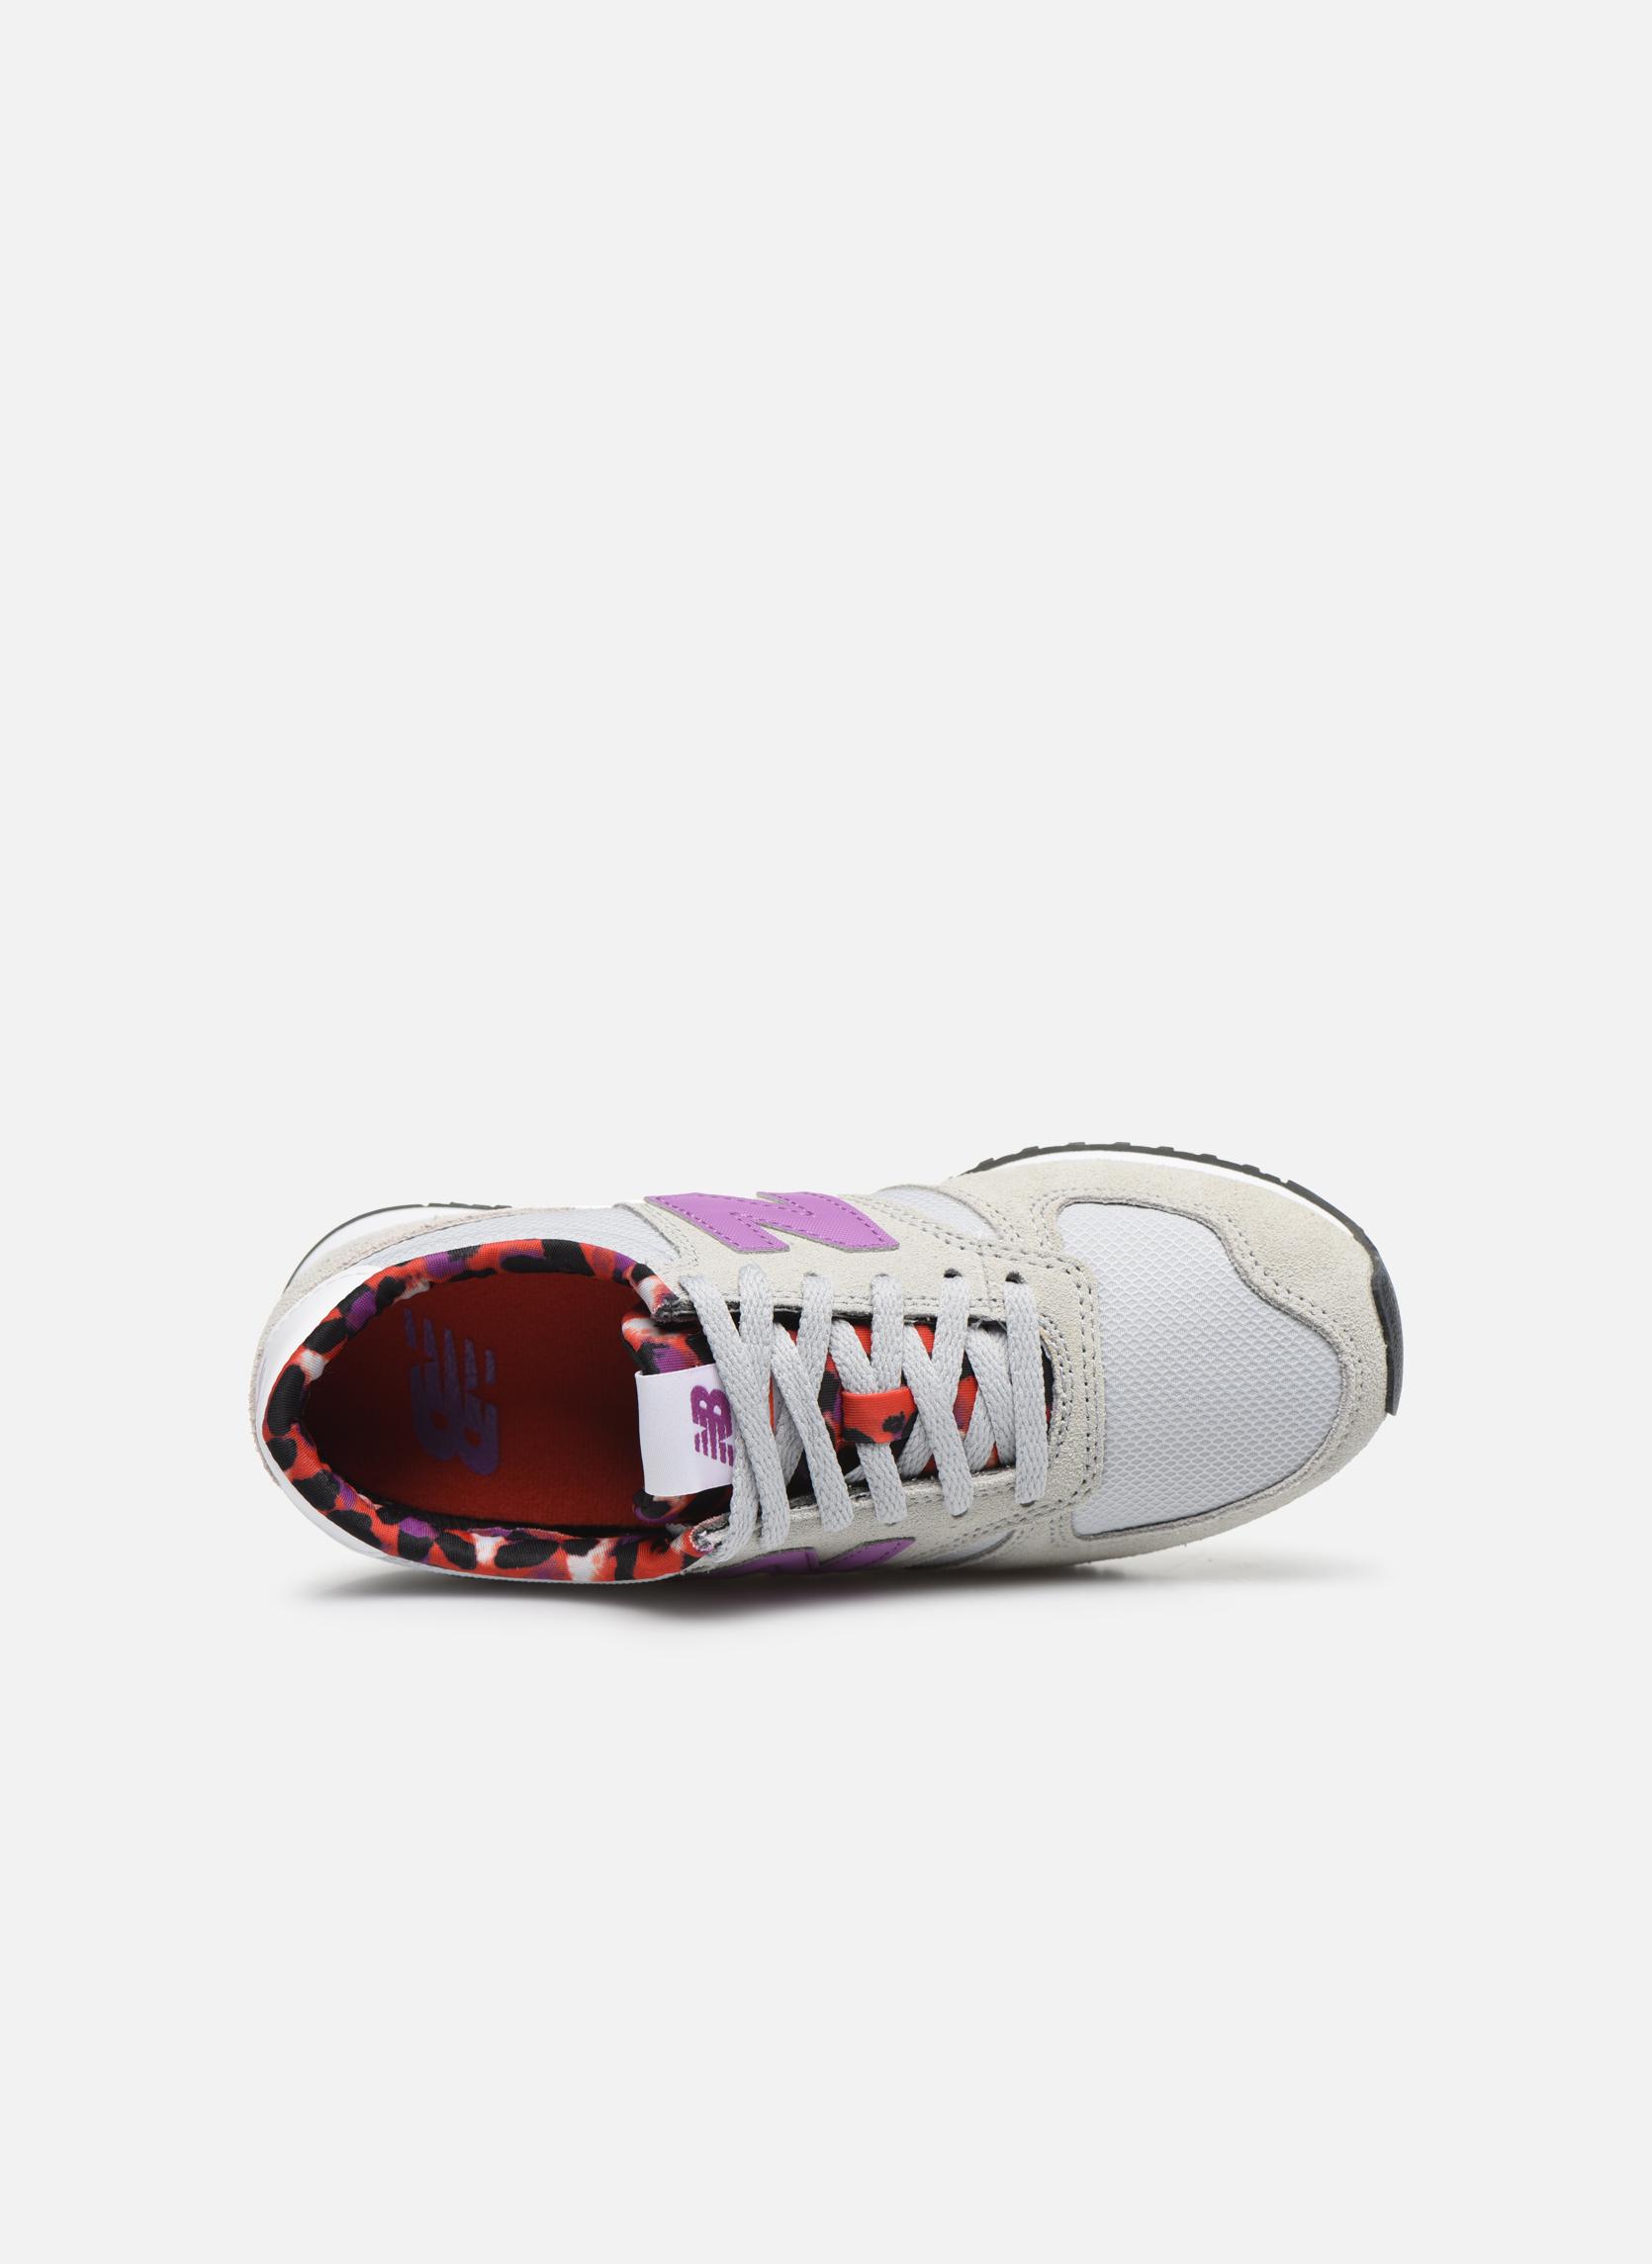 DFI Poison Berry New Balance WL420 (Rose)